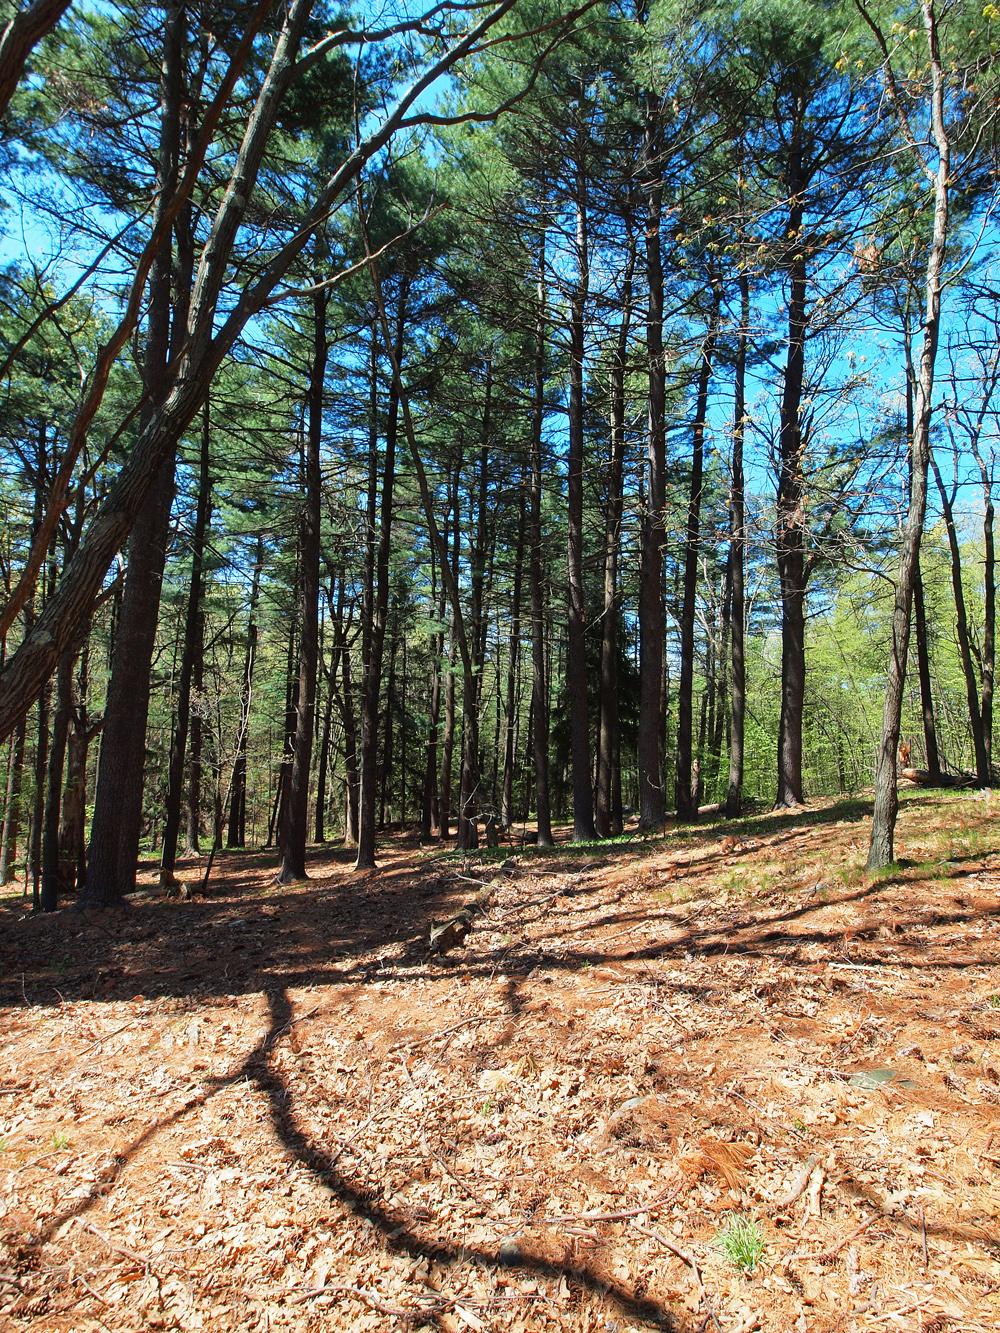 Woodlands and Pine cones